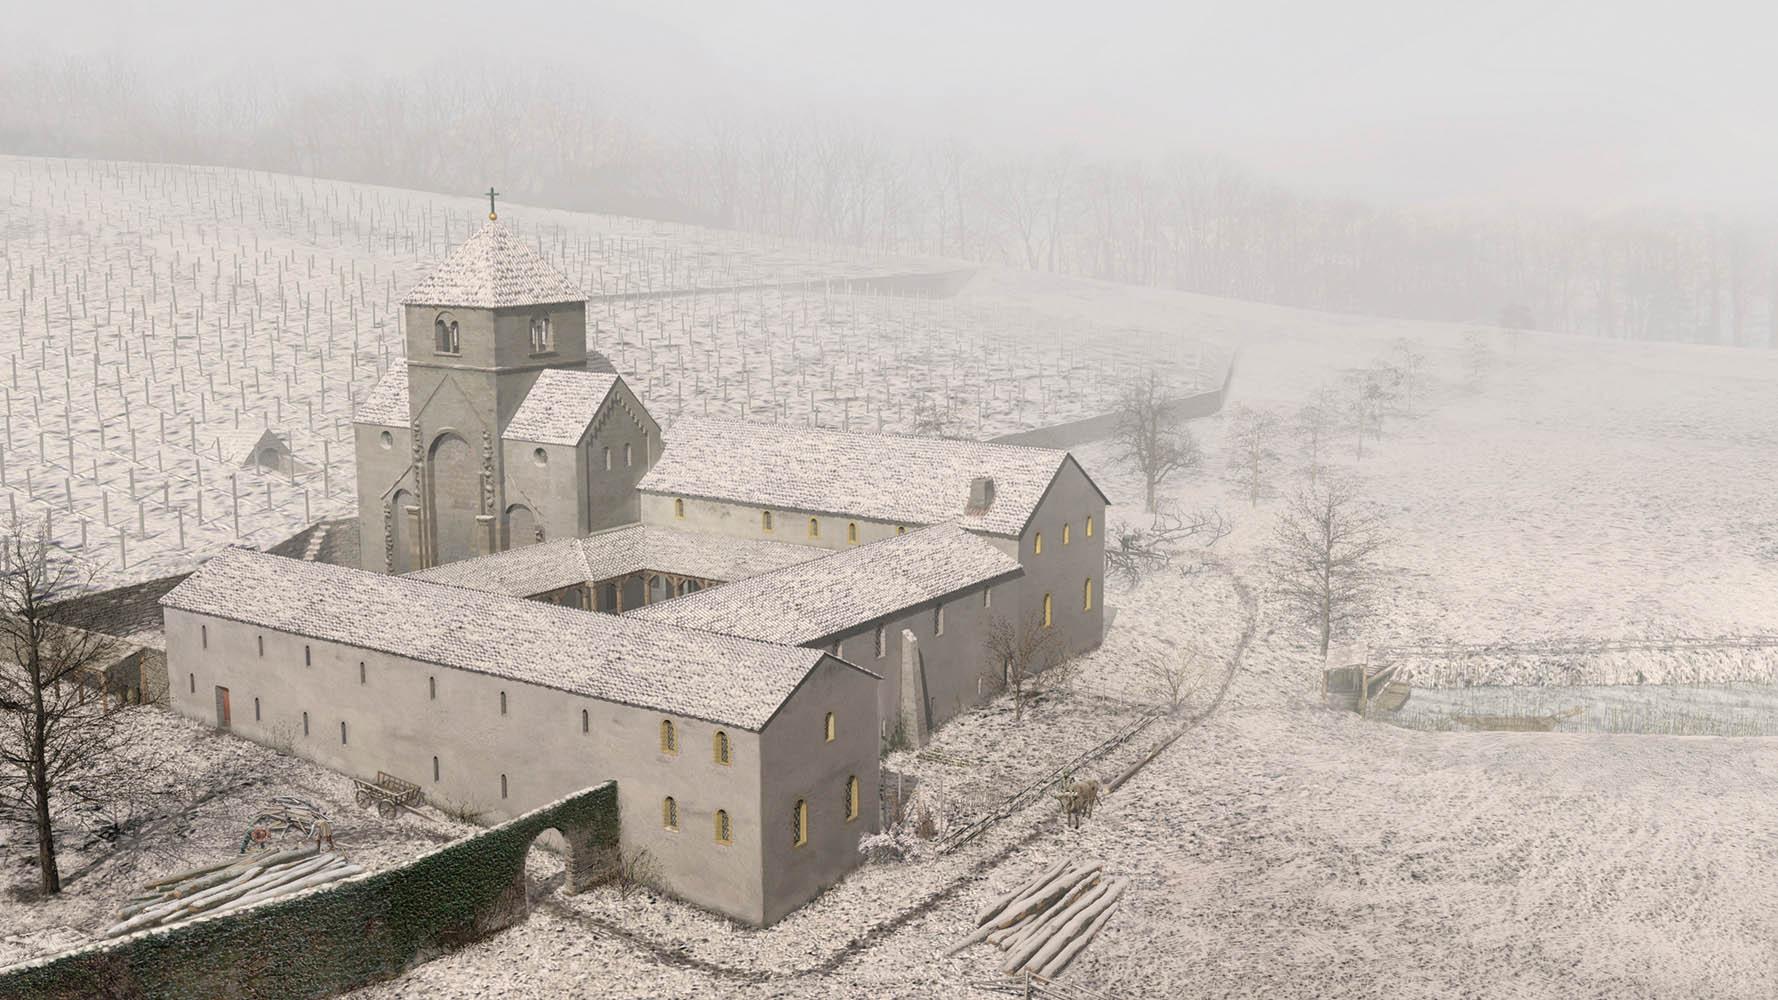 Kloster St. Petersinsel im Winter